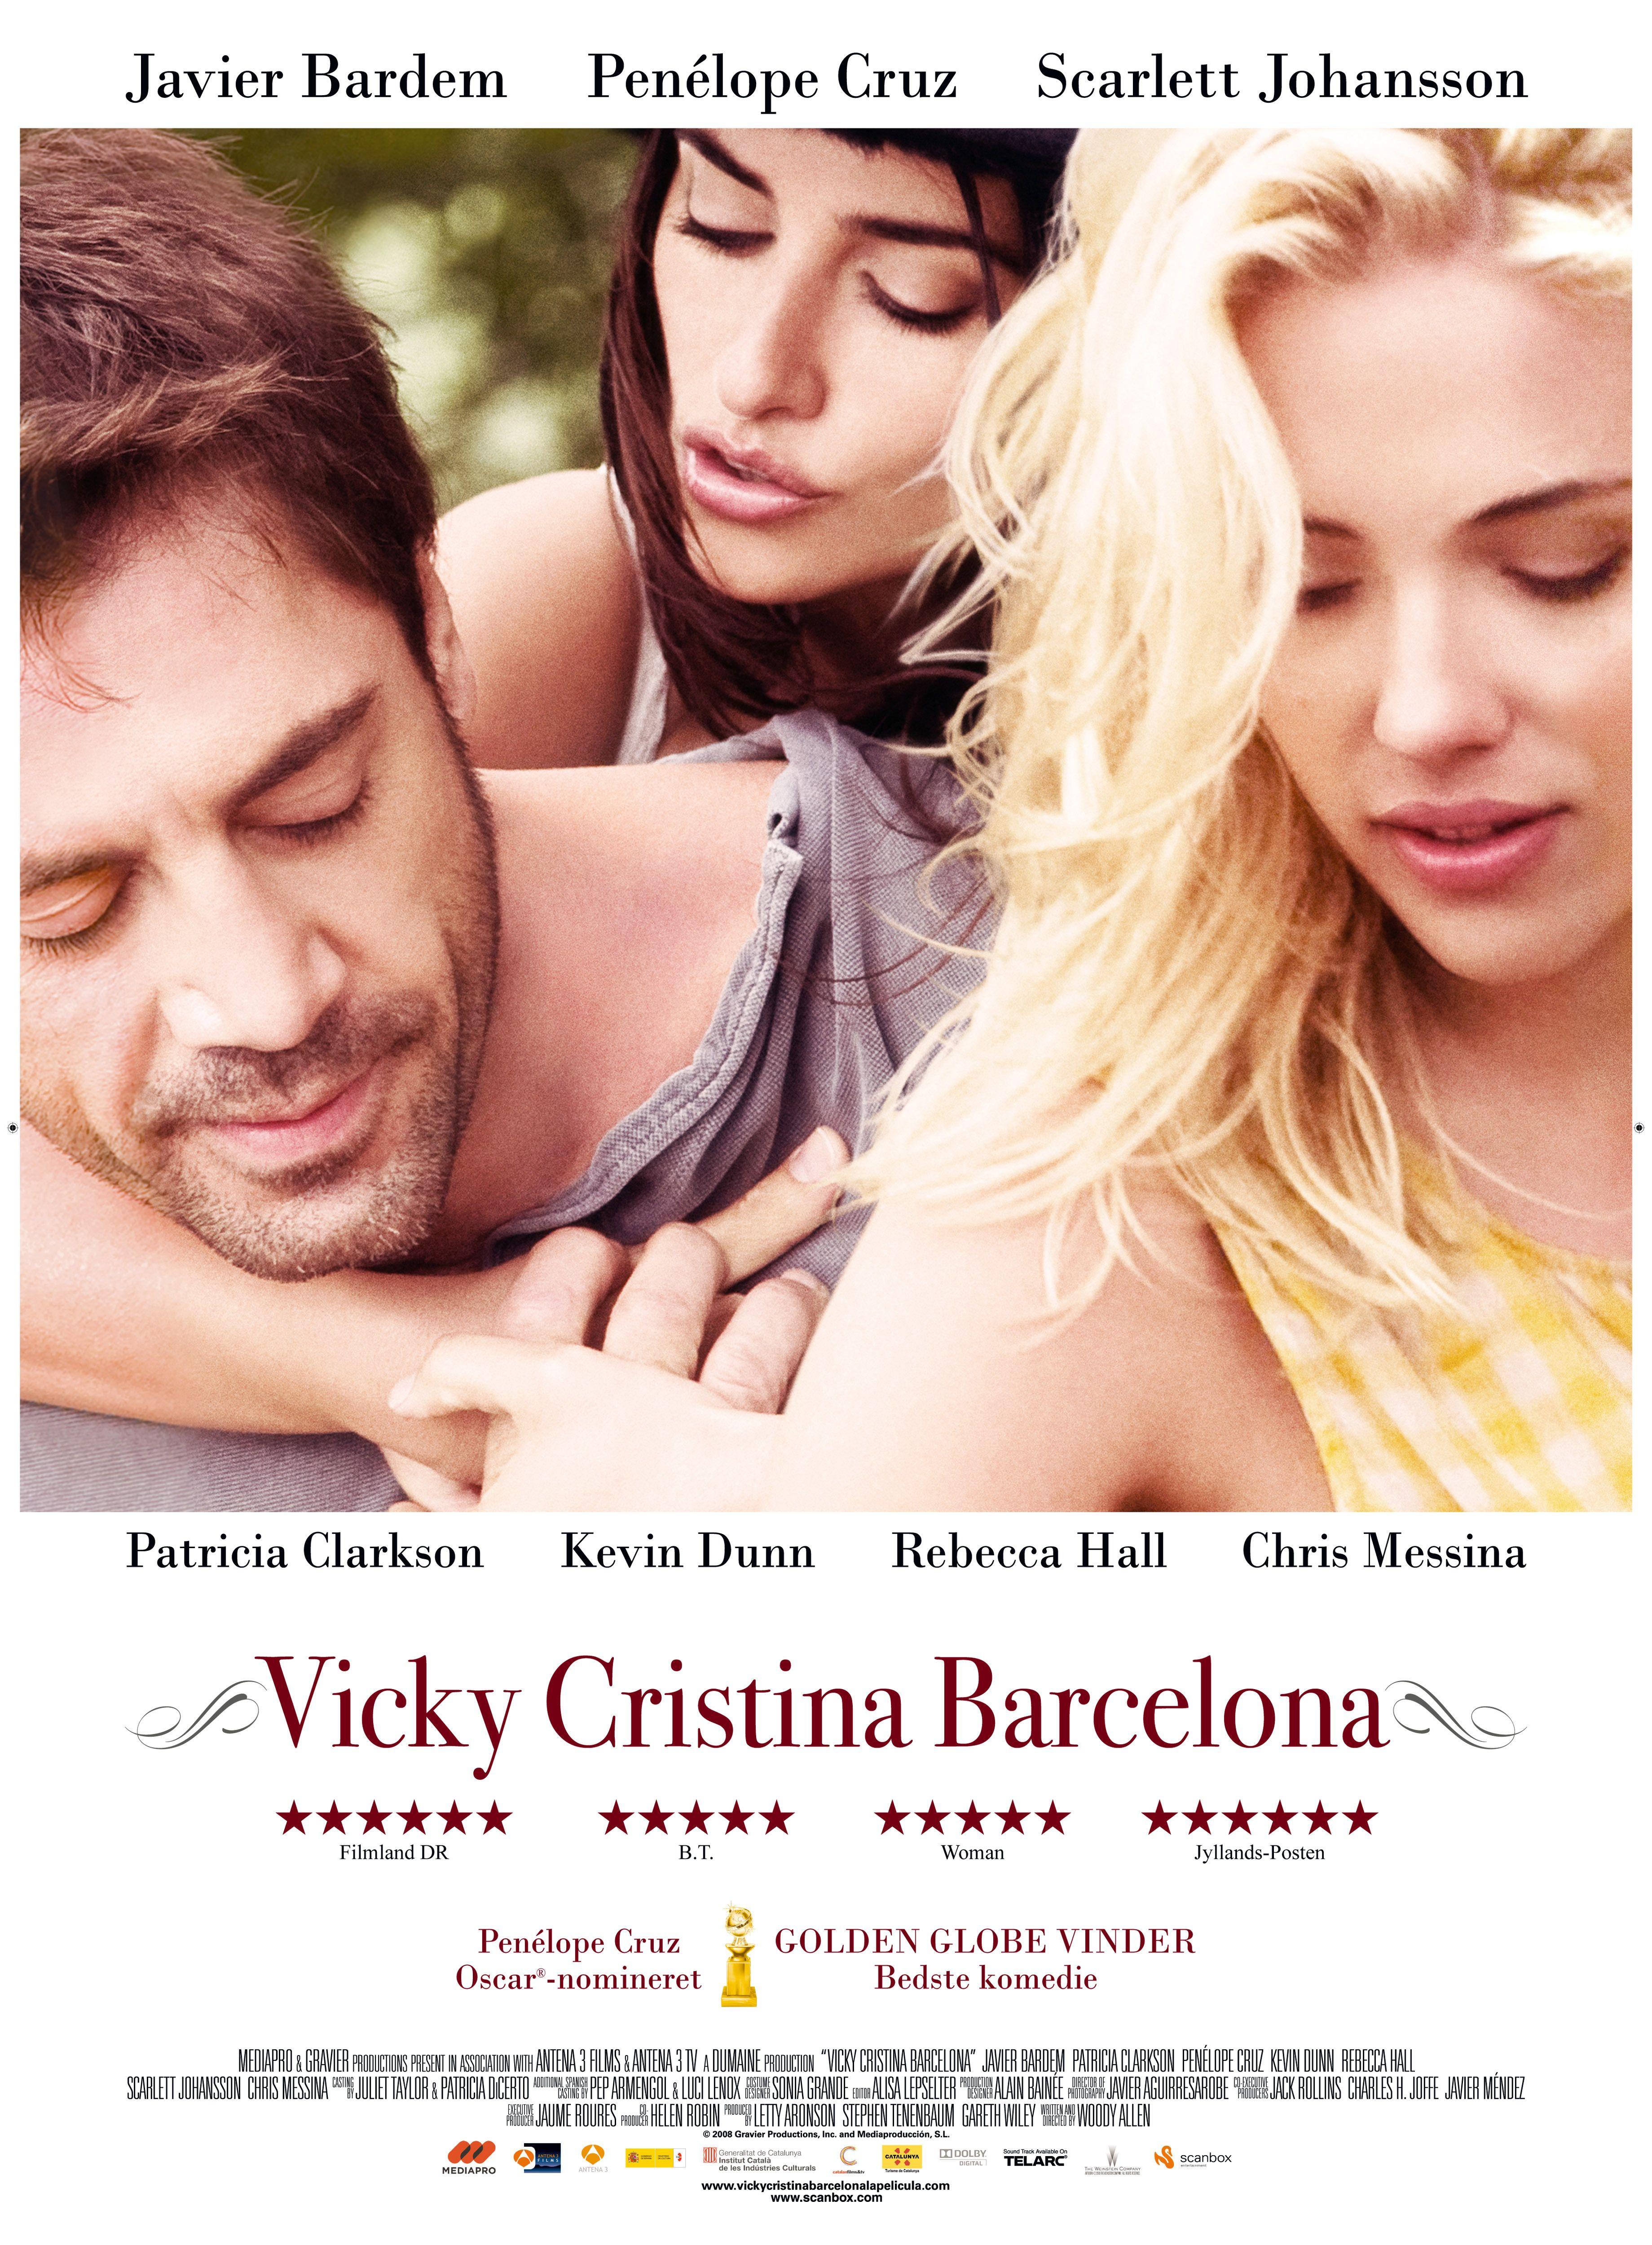 Vicky Cristina Barcelona Fantastische Film Vicky Cristina Barcelona Woody Allen Woody Allen Movies